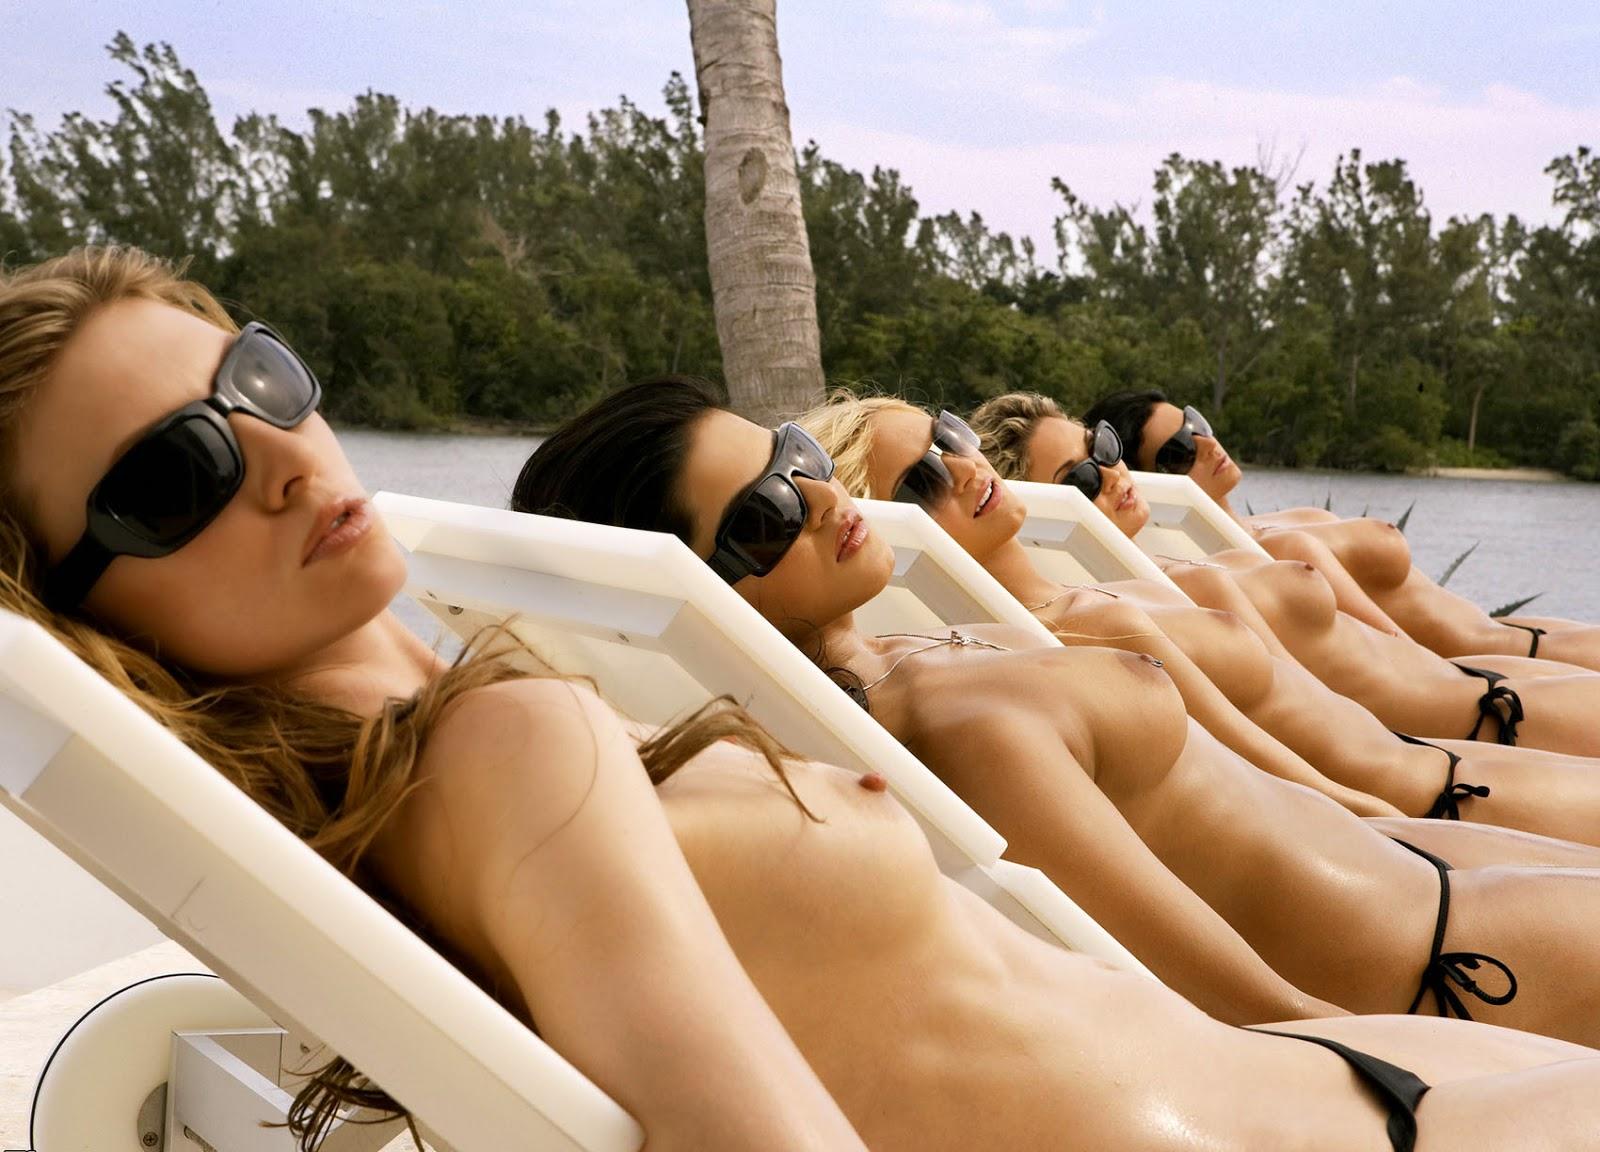 Sexy Girl Nude Id 2 Porn Stars Group Photos-1300